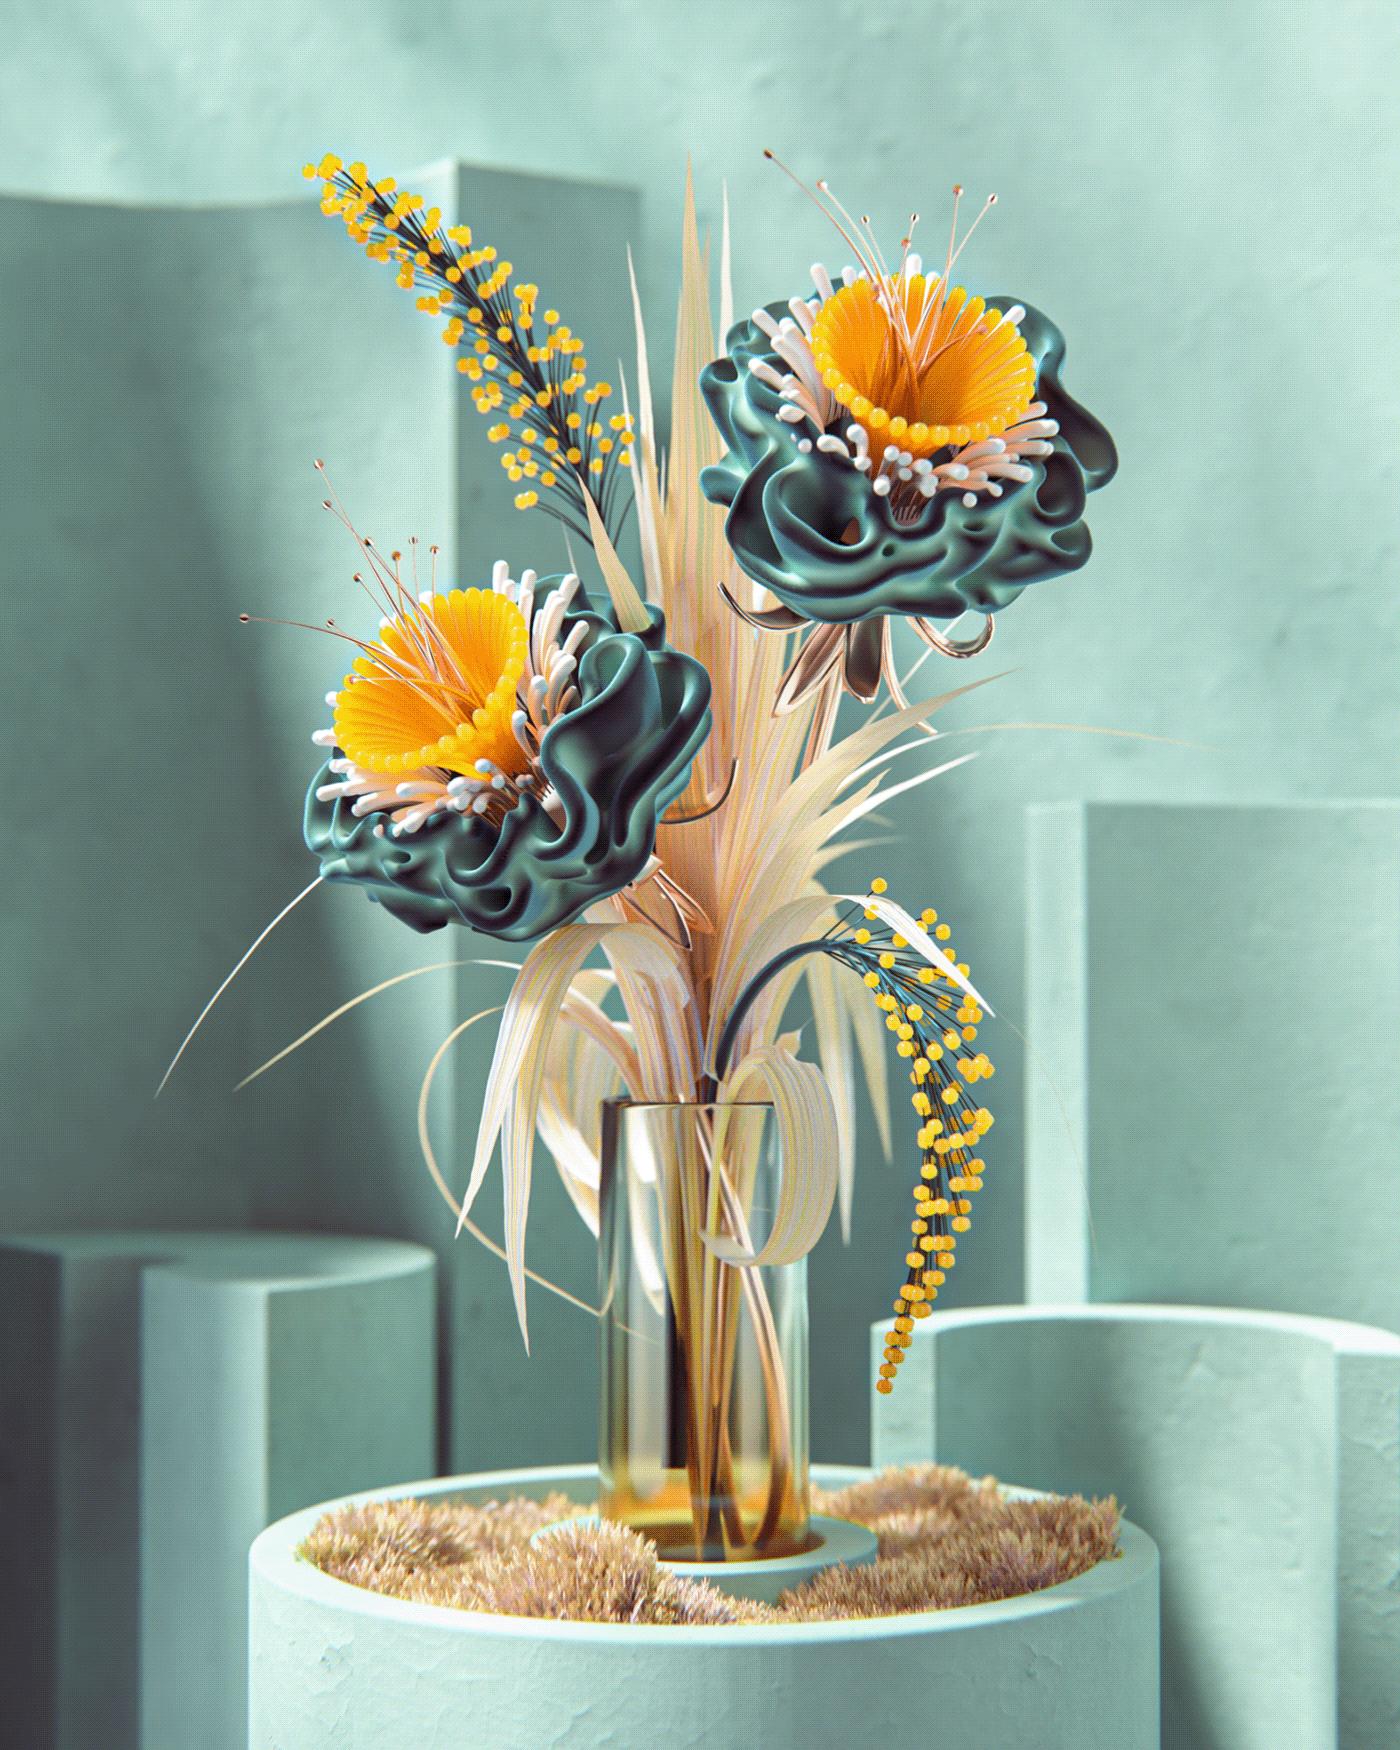 3D art design inspiration instagram photo photorealistic Realism Still